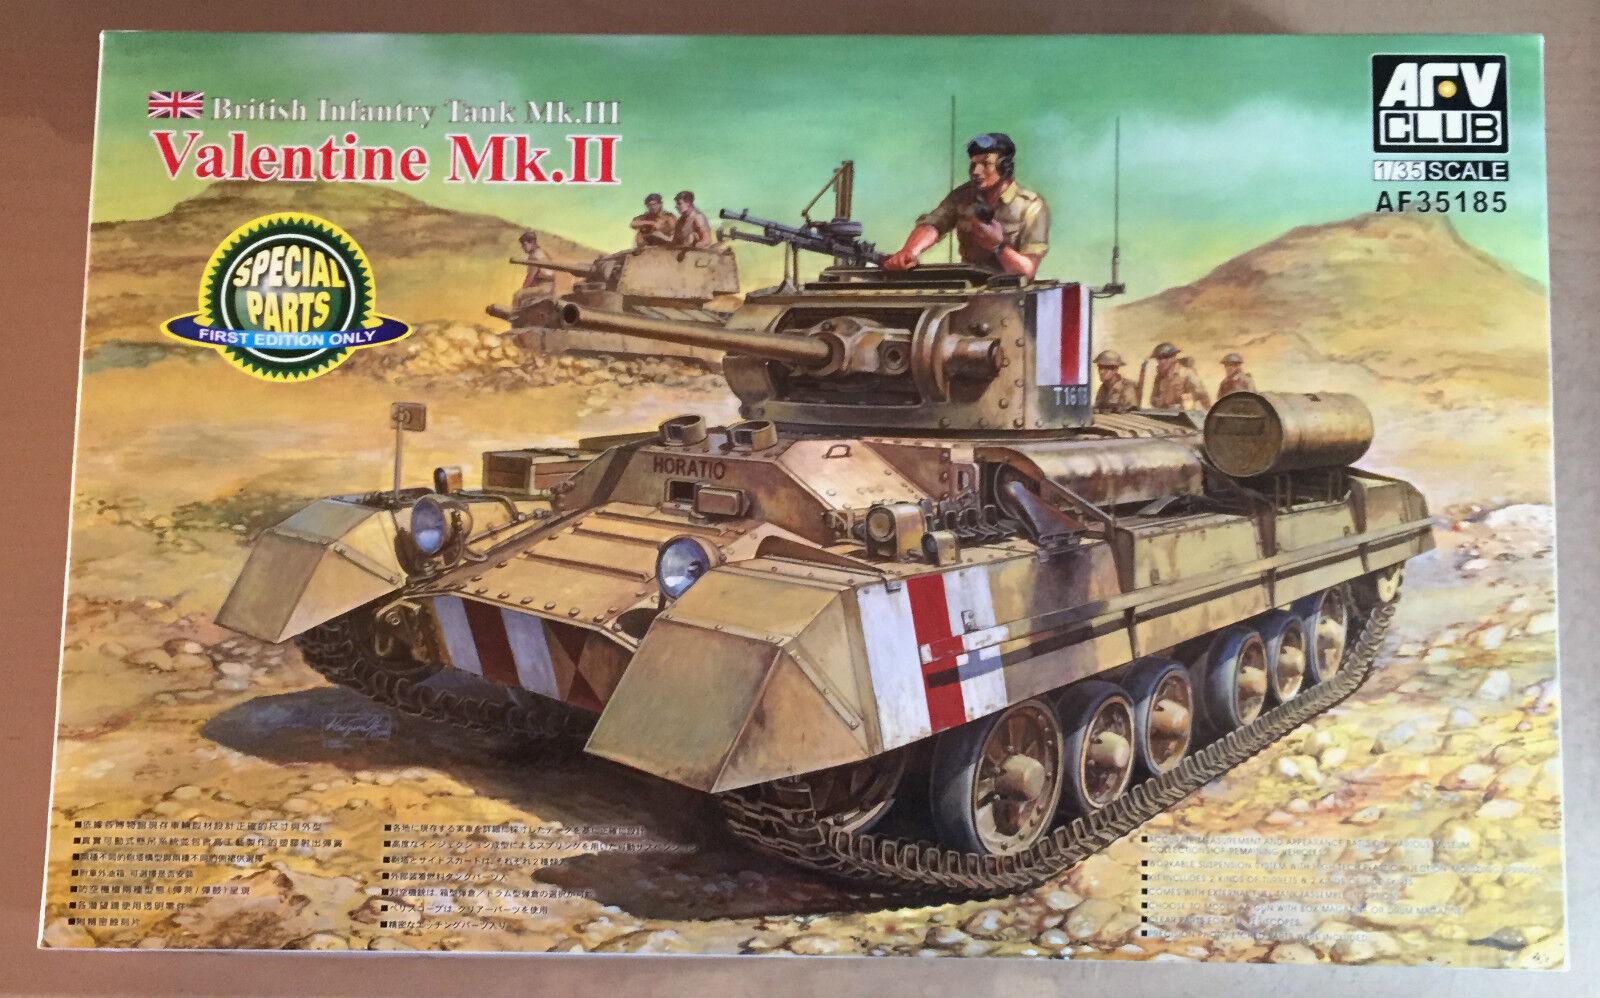 AFV Club af35185 - 1 35 Valentine Mk. II British Infantry Tank Mk. III-NEW